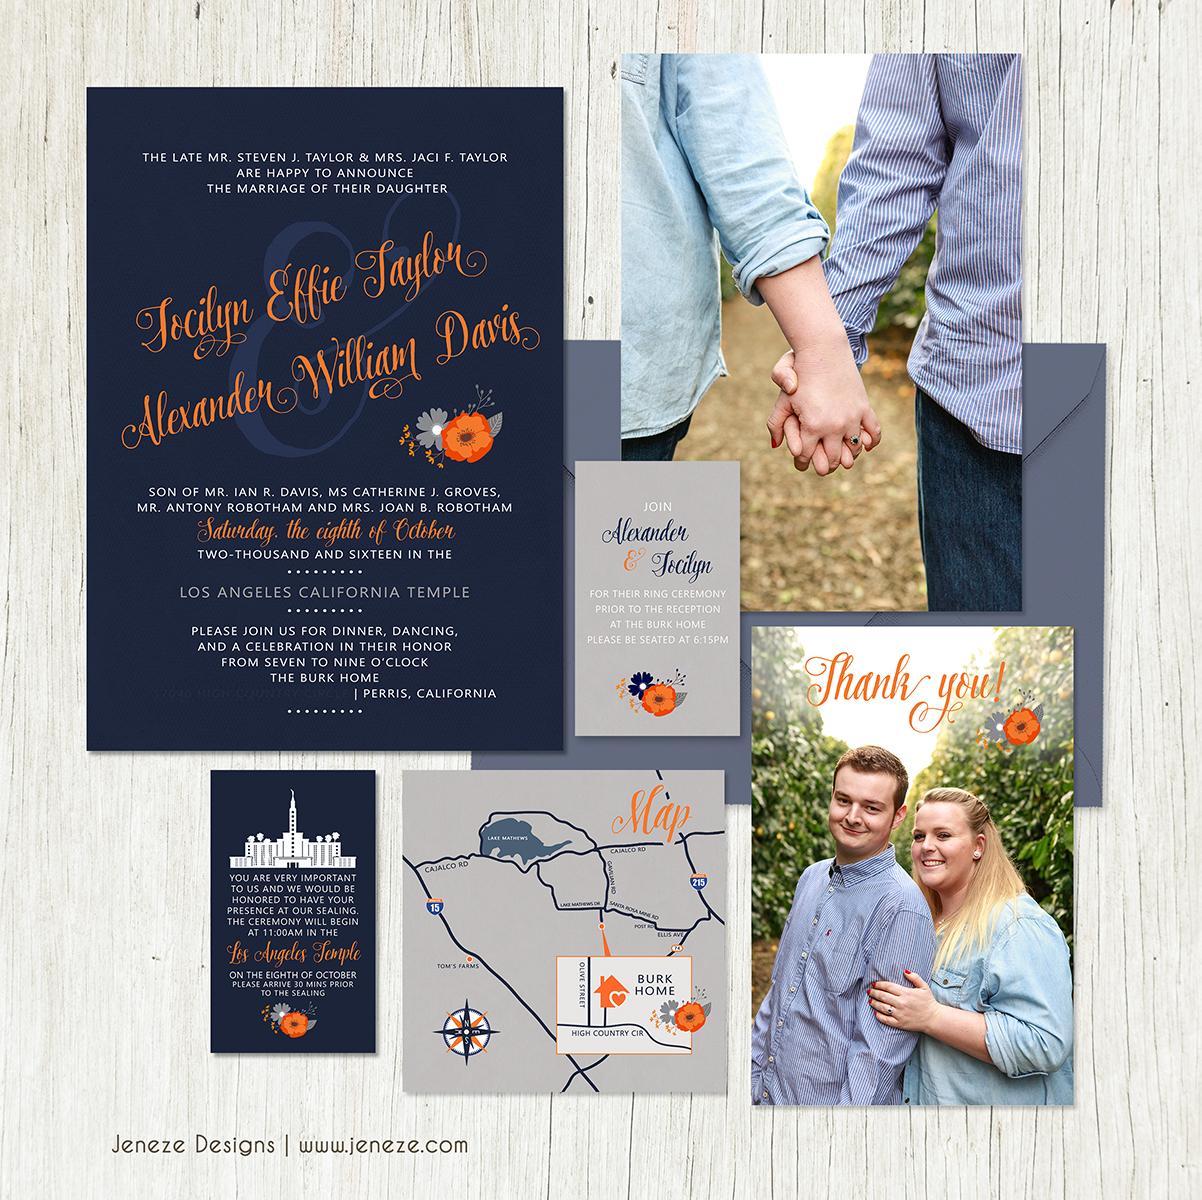 Wedding invitations jeneze designs ca289 monicamarmolfo Images